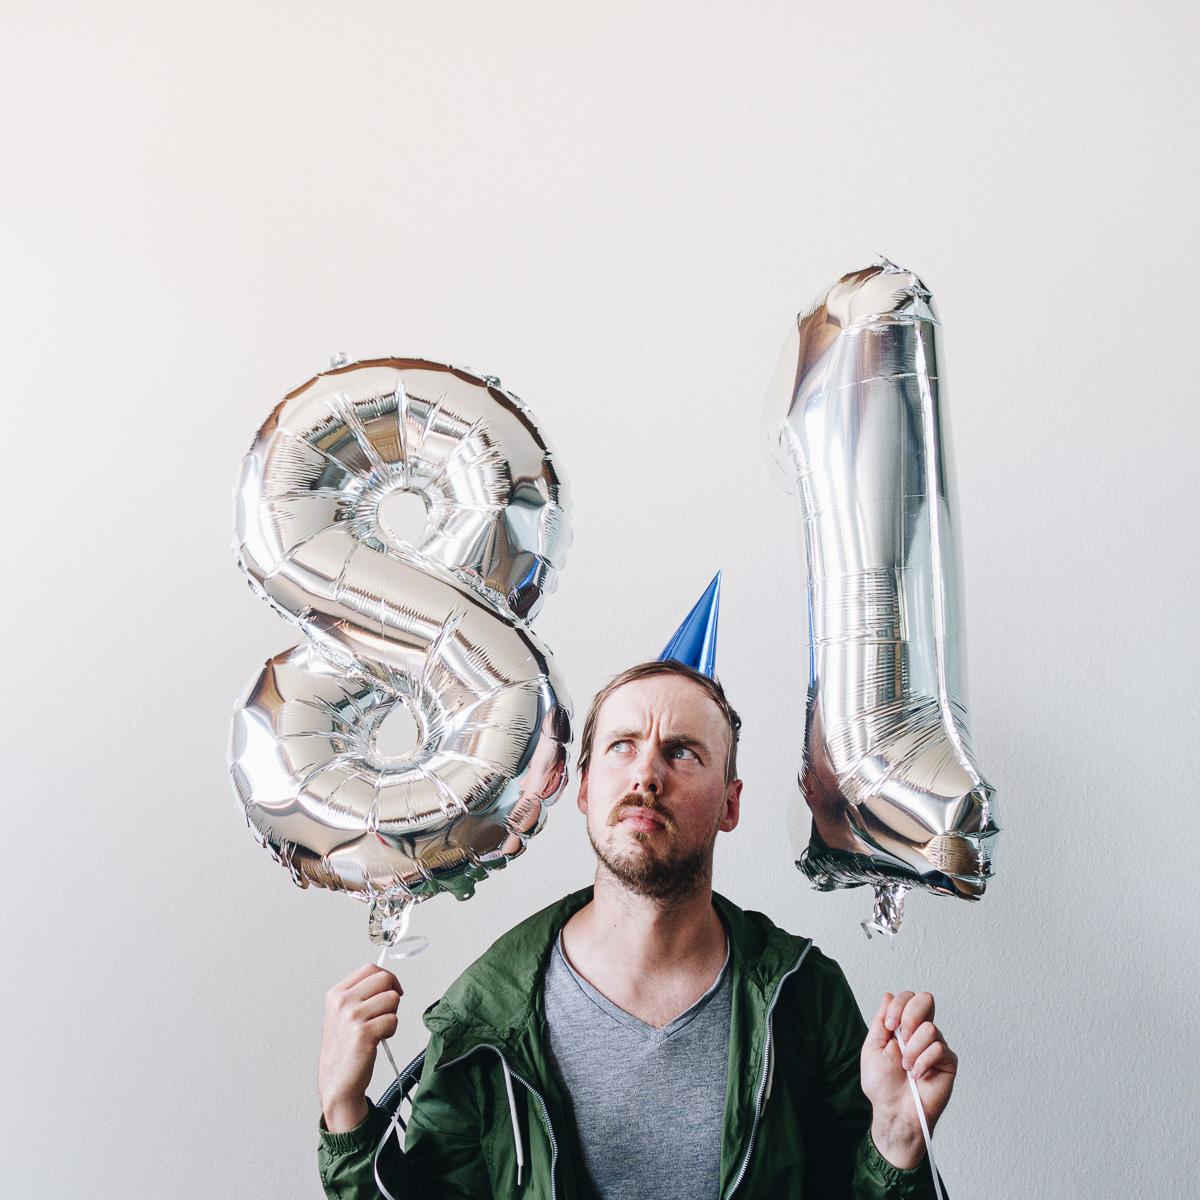 regali per lui palloncini a forma di numeri giganti